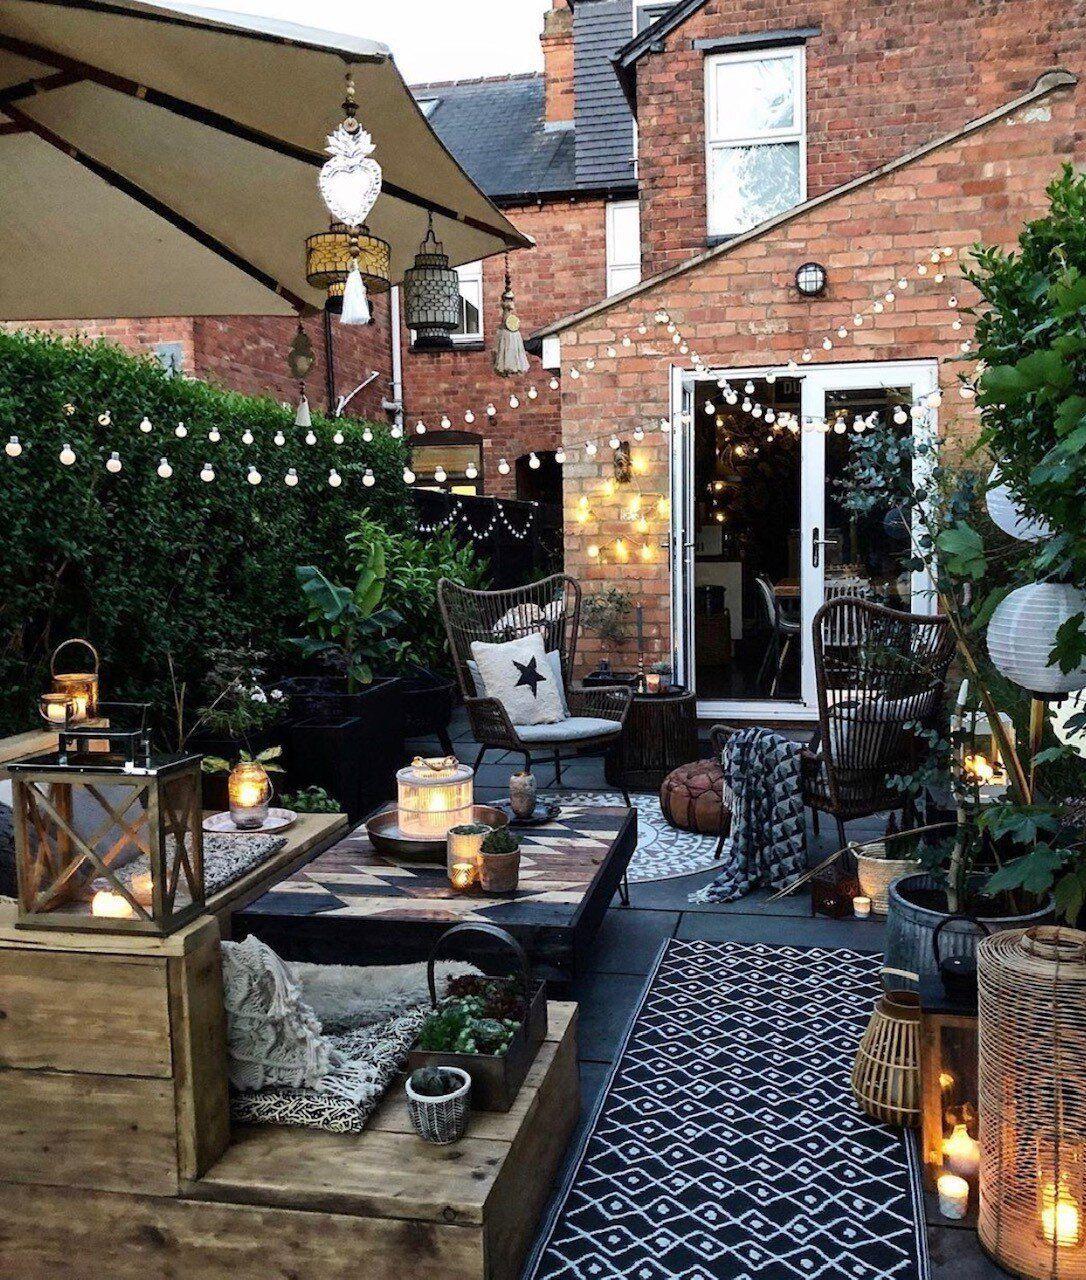 Pin on Backyard in 2020 | Garden design ideas on a budget ... on Courtyard Ideas On A Budget id=94803